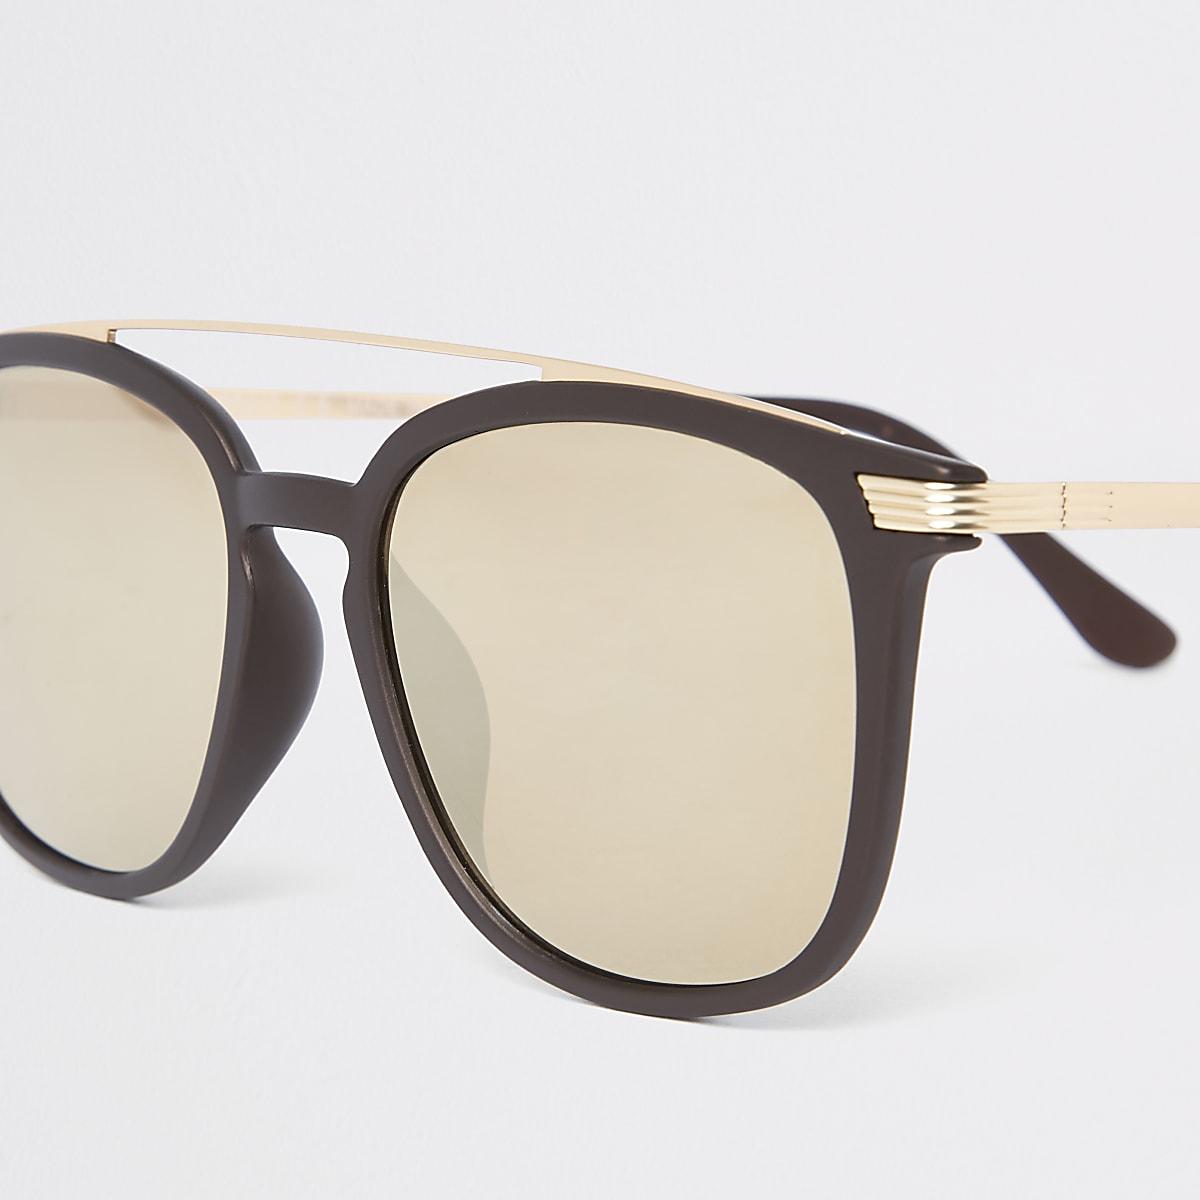 84b6707cd Brown brow bar navigator sunglasses - Aviator Sunglasses ...